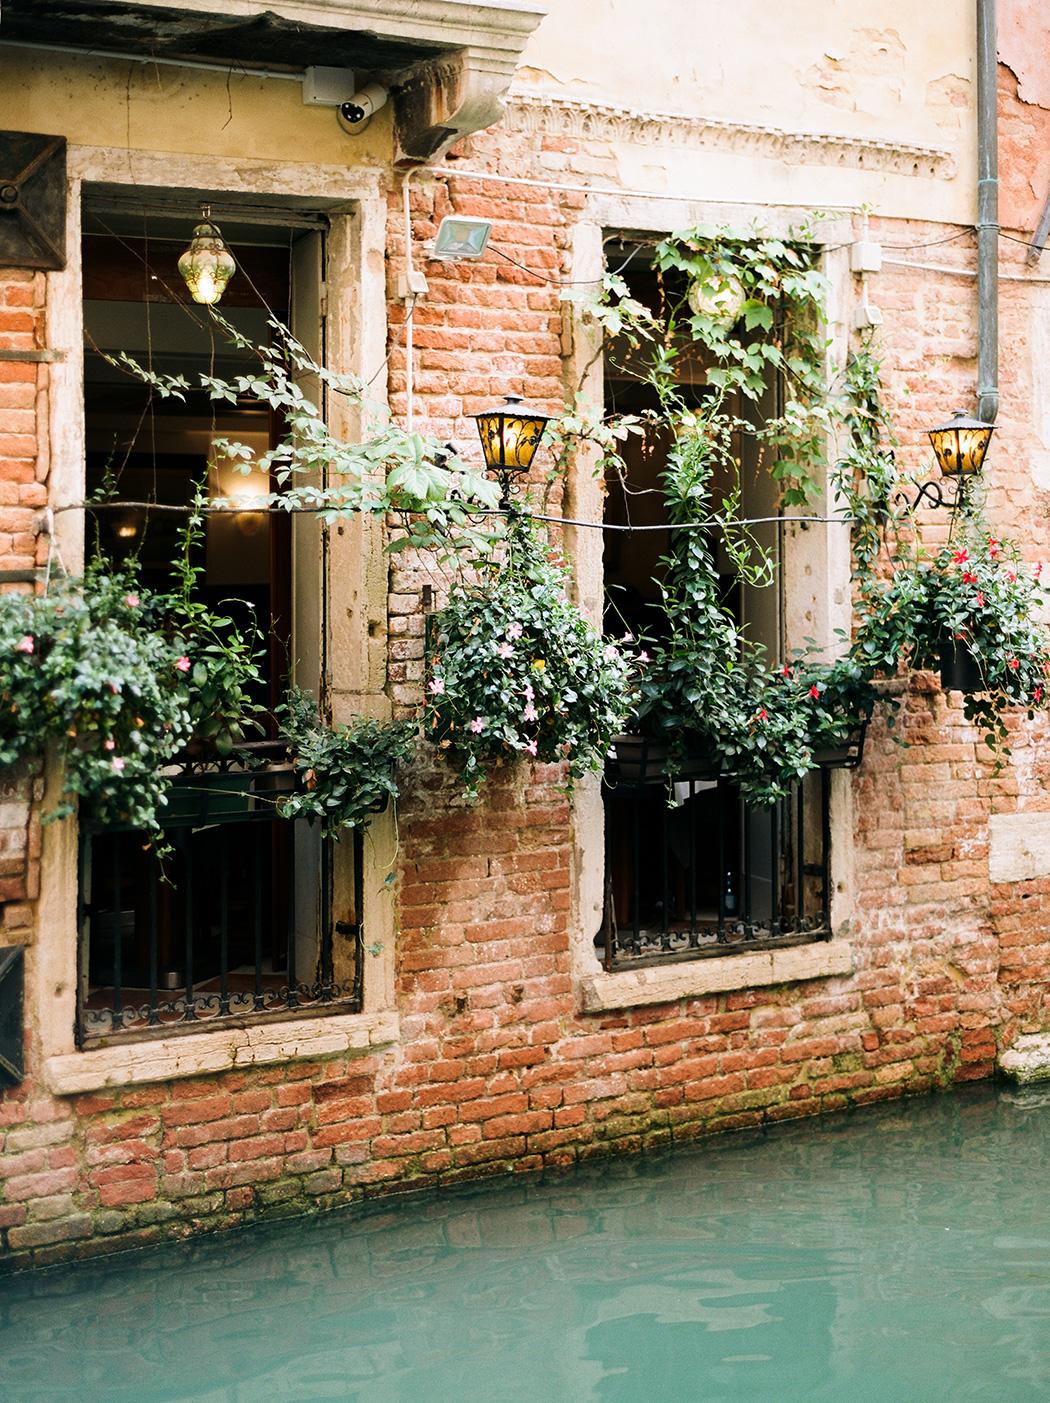 070S&E_Venice.jpg